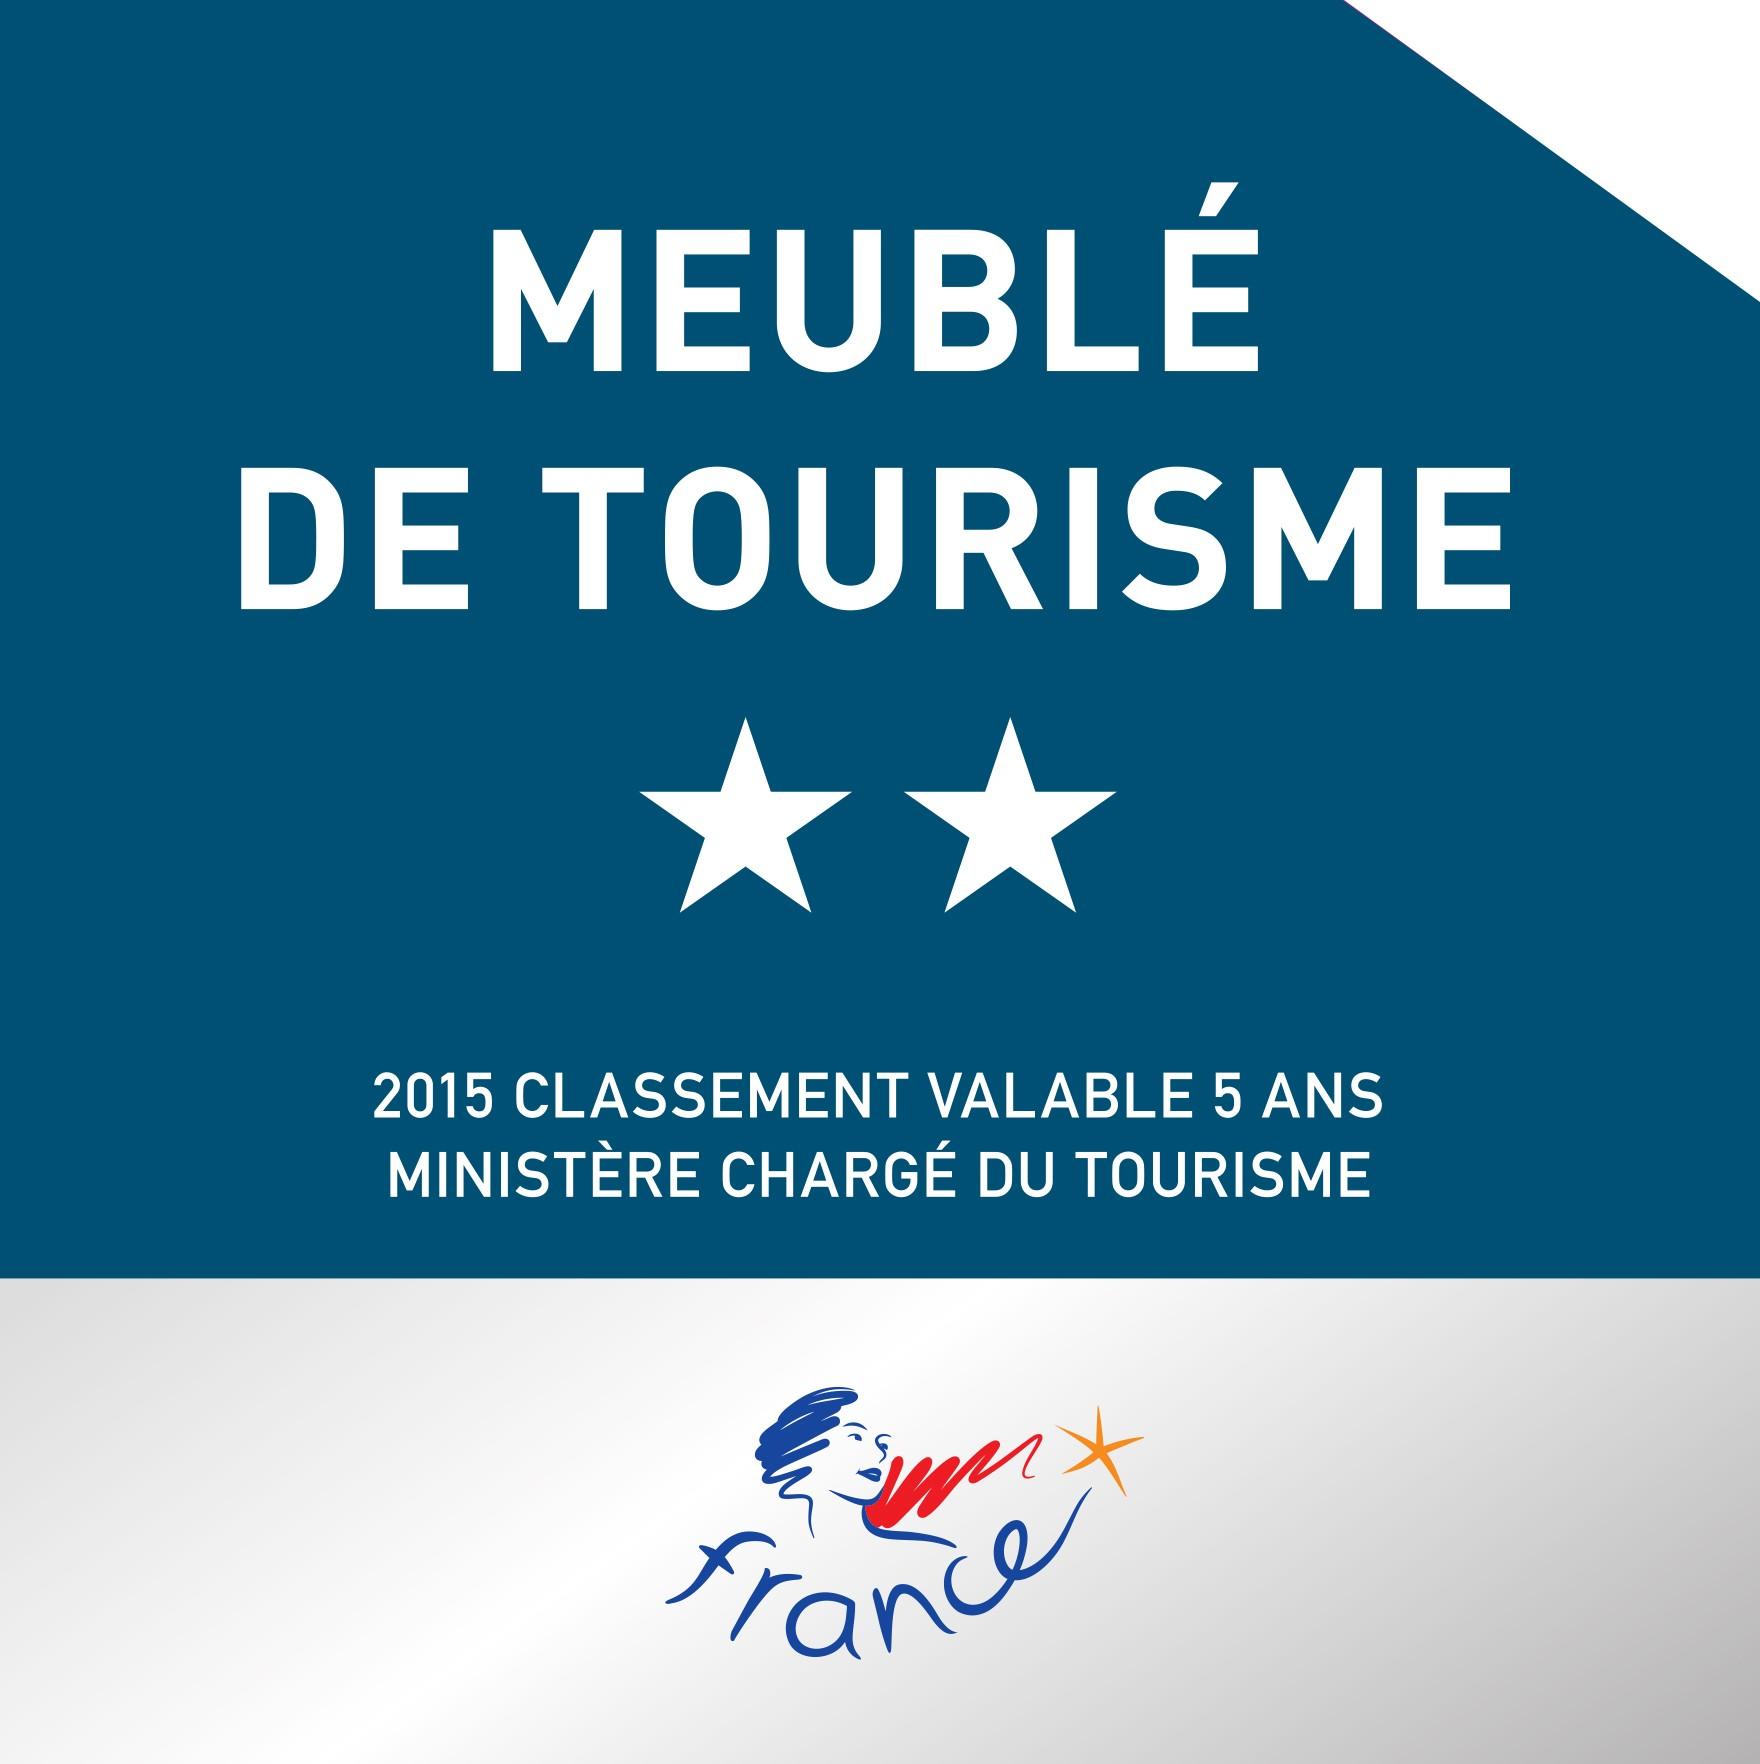 plaque-meuble-tourisme2-2015-11618